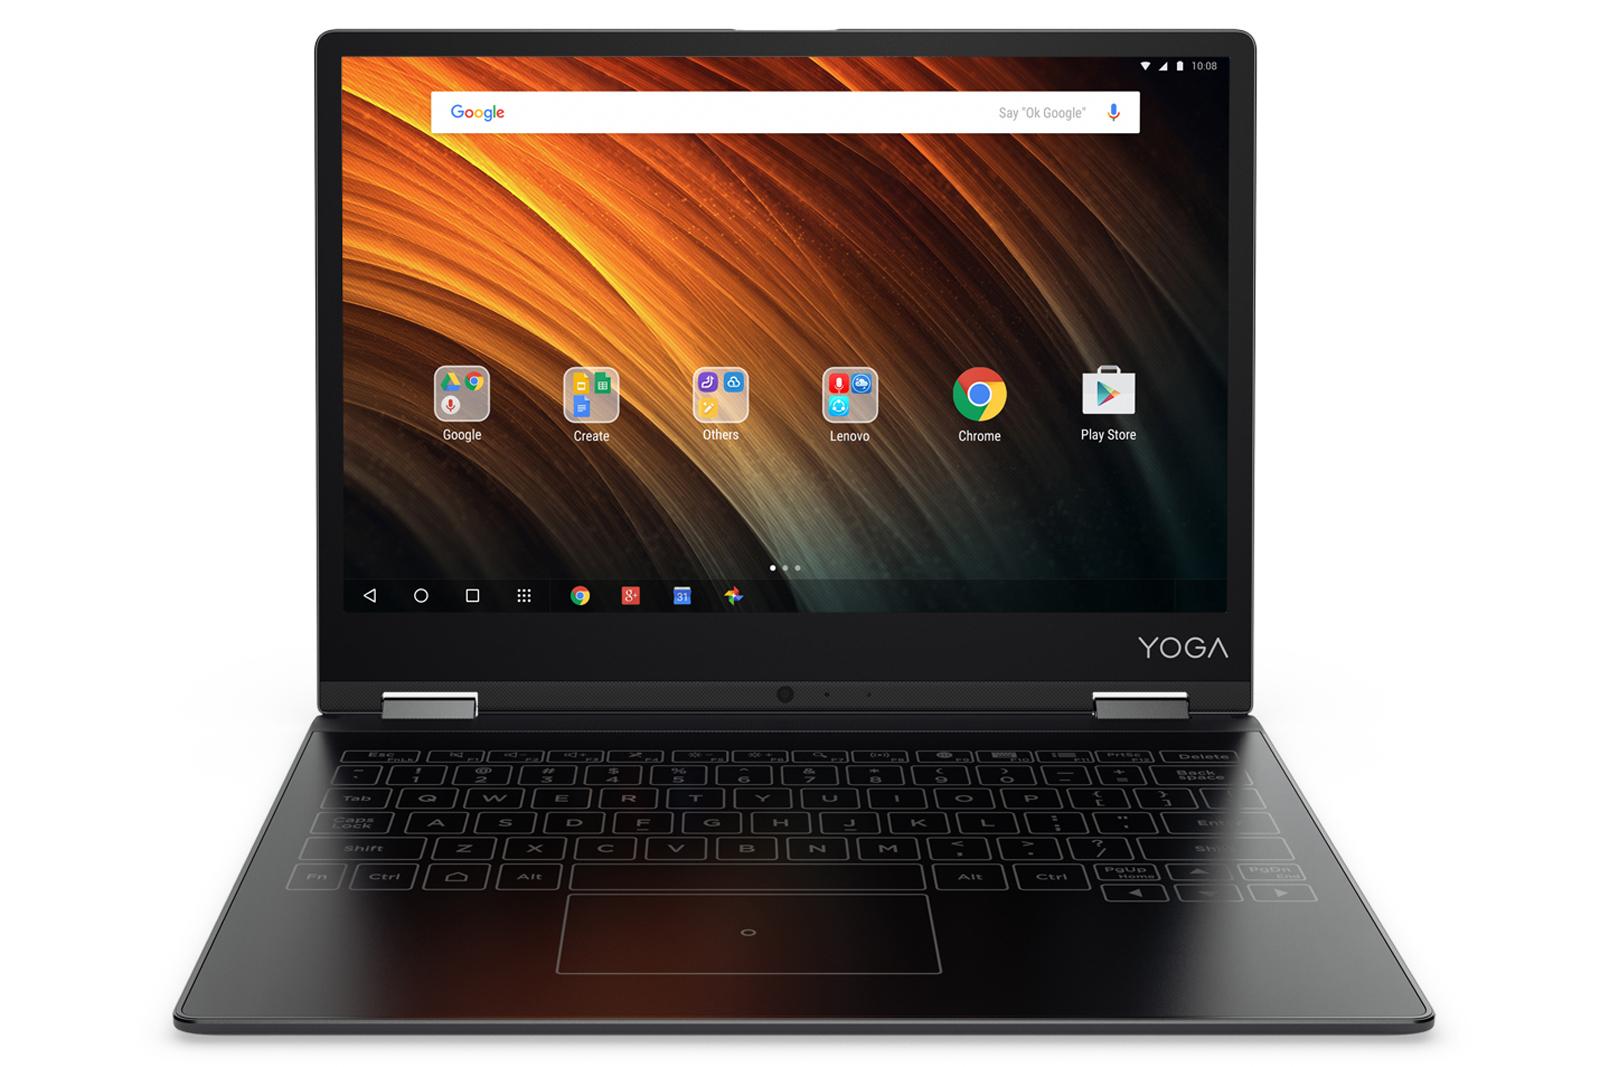 Lenovo Yoga A12 Offiziell Vorgestellt Engadget Deutschland